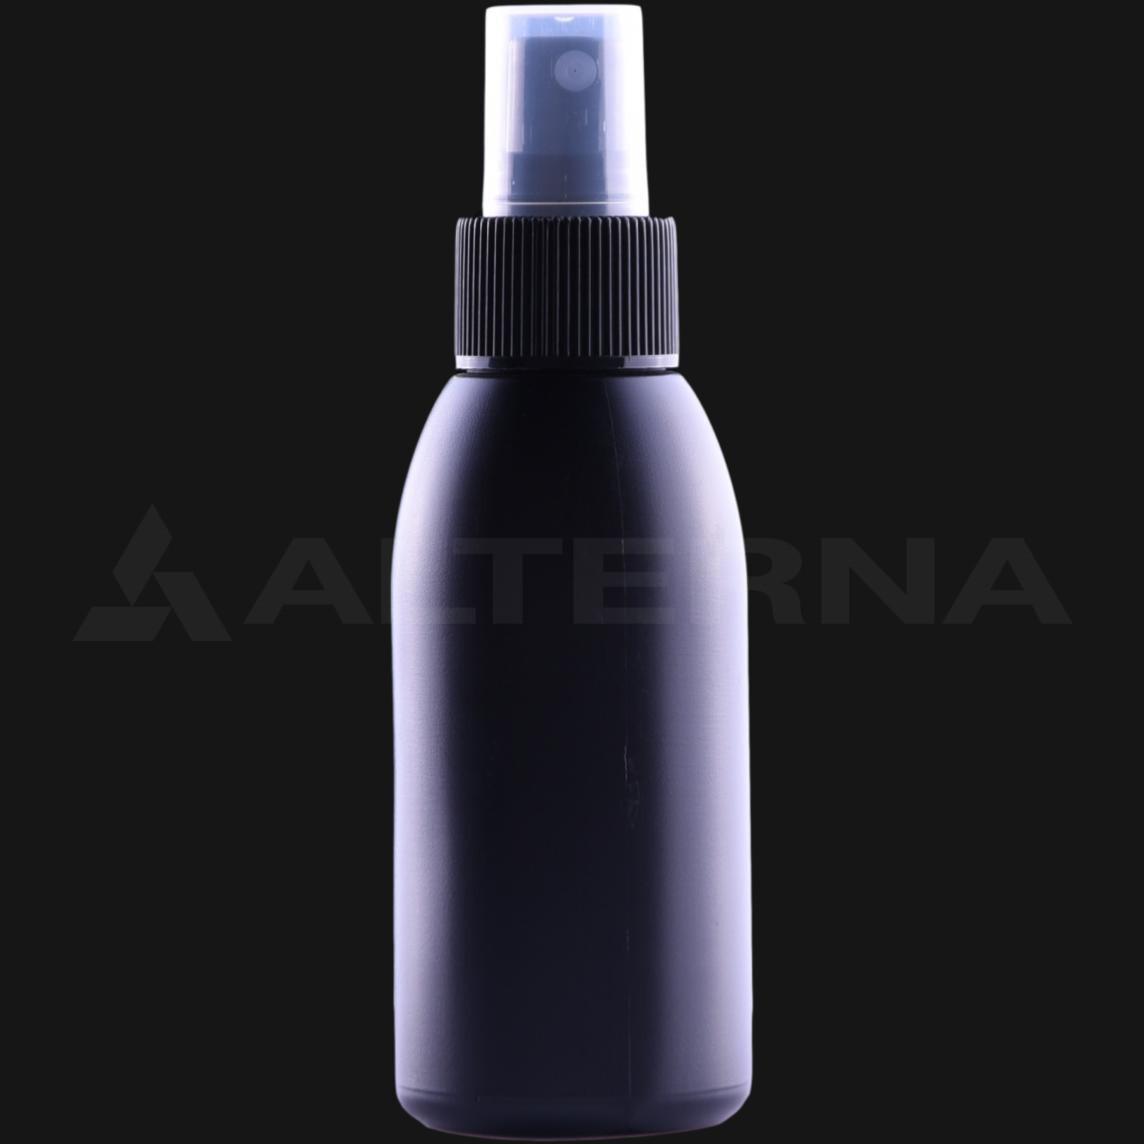 100 ml HDPE Bottle with 24 mm Sprayer